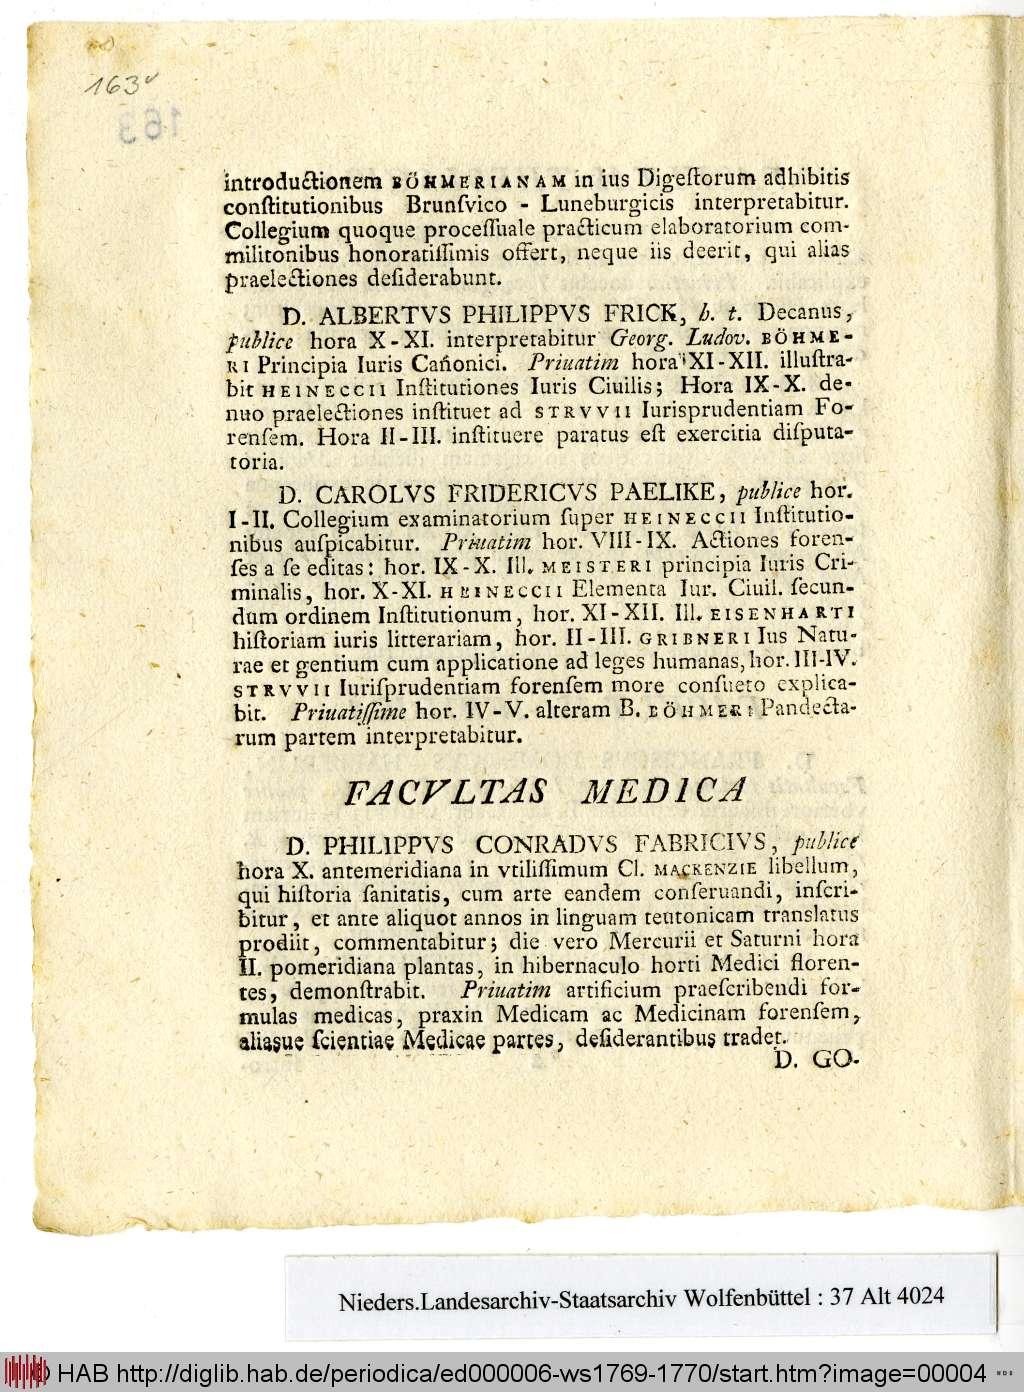 http://diglib.hab.de/periodica/ed000006-ws1769-1770/00004.jpg